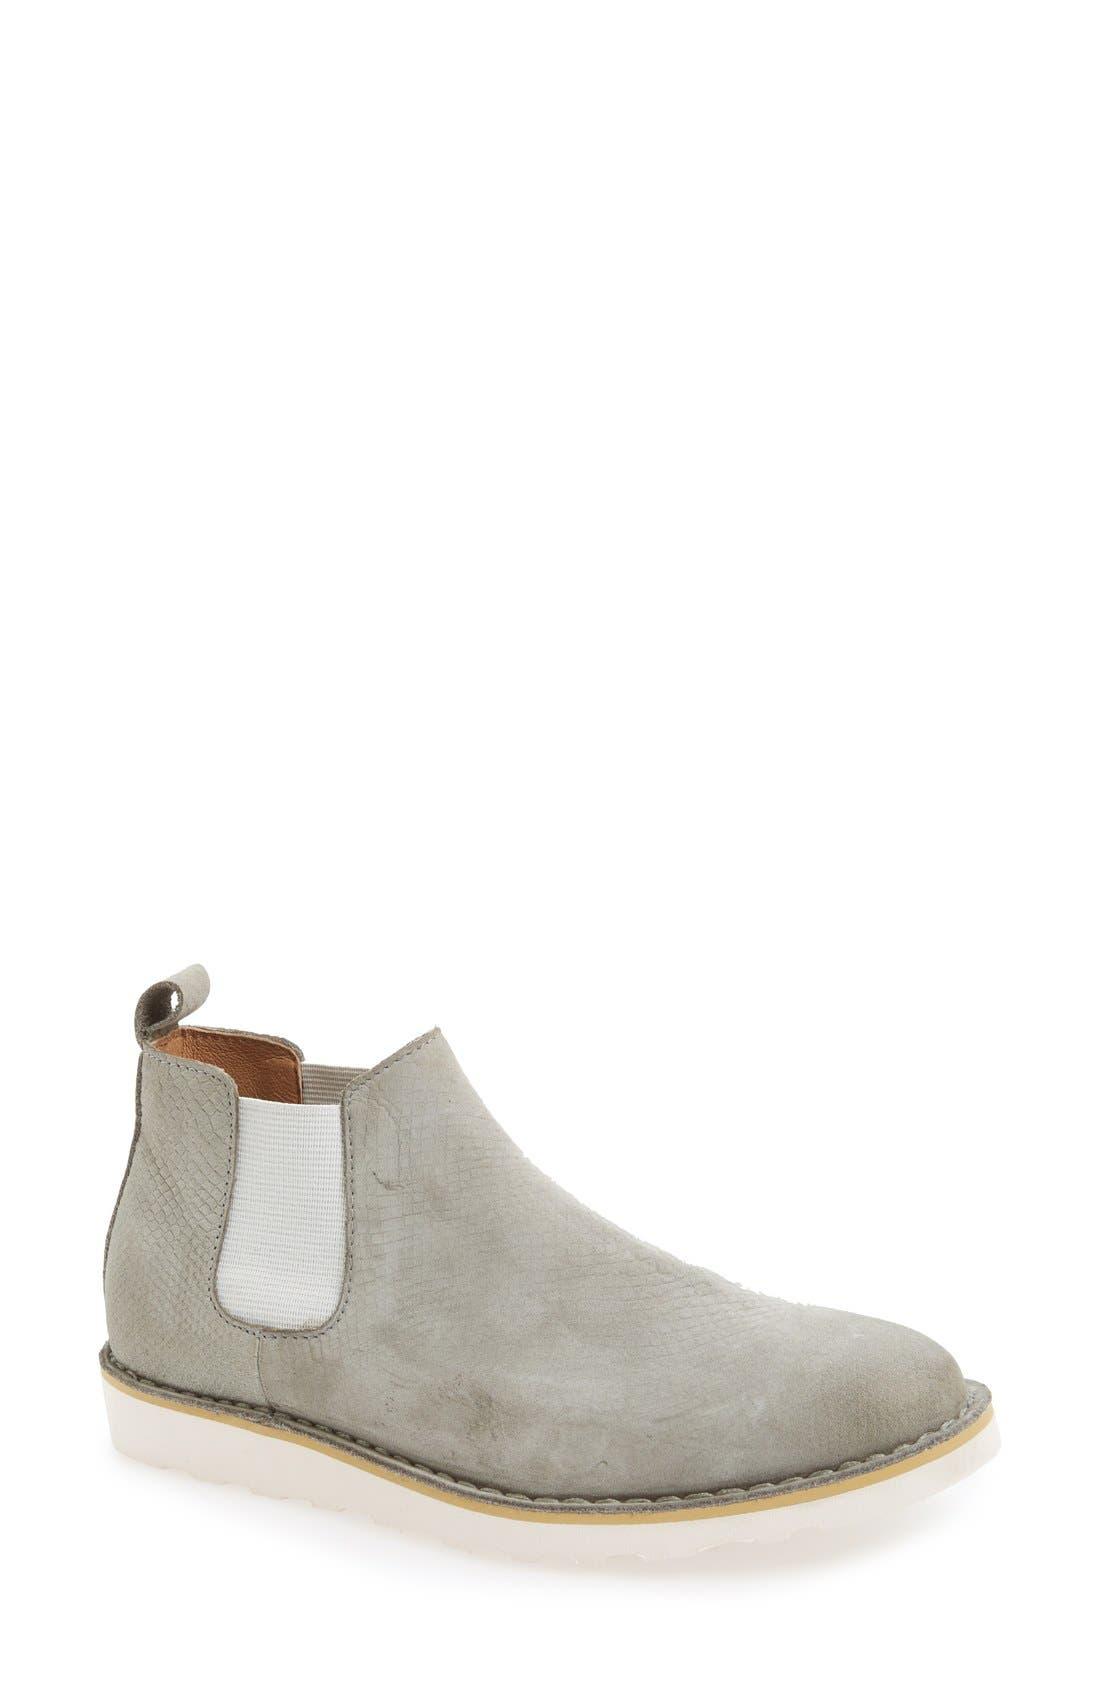 Alternate Image 1 Selected - Blackstone 'LL72' Chukka Boot (Women)